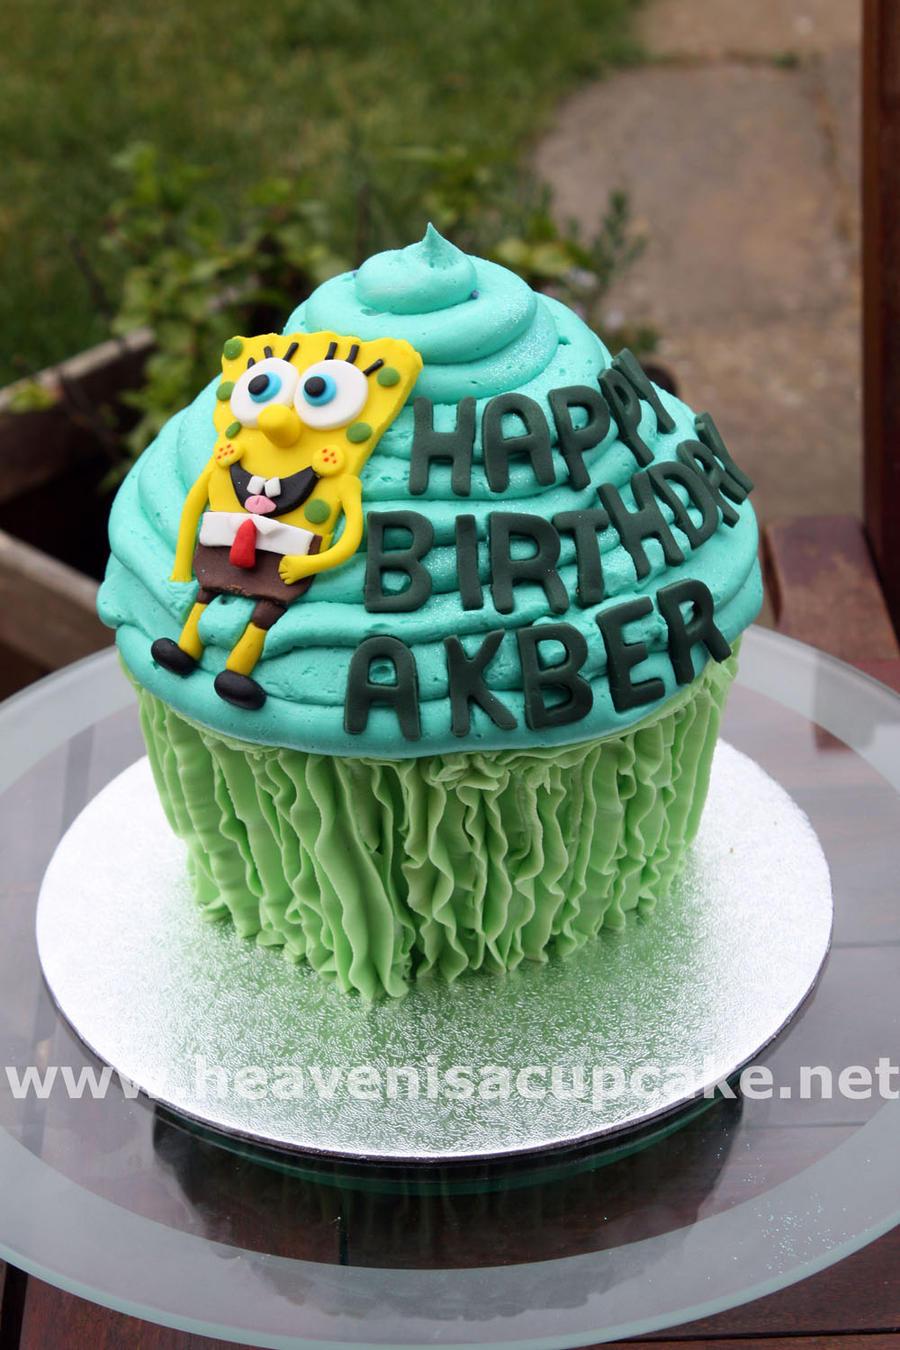 Spongebob Cakepants by peeka85